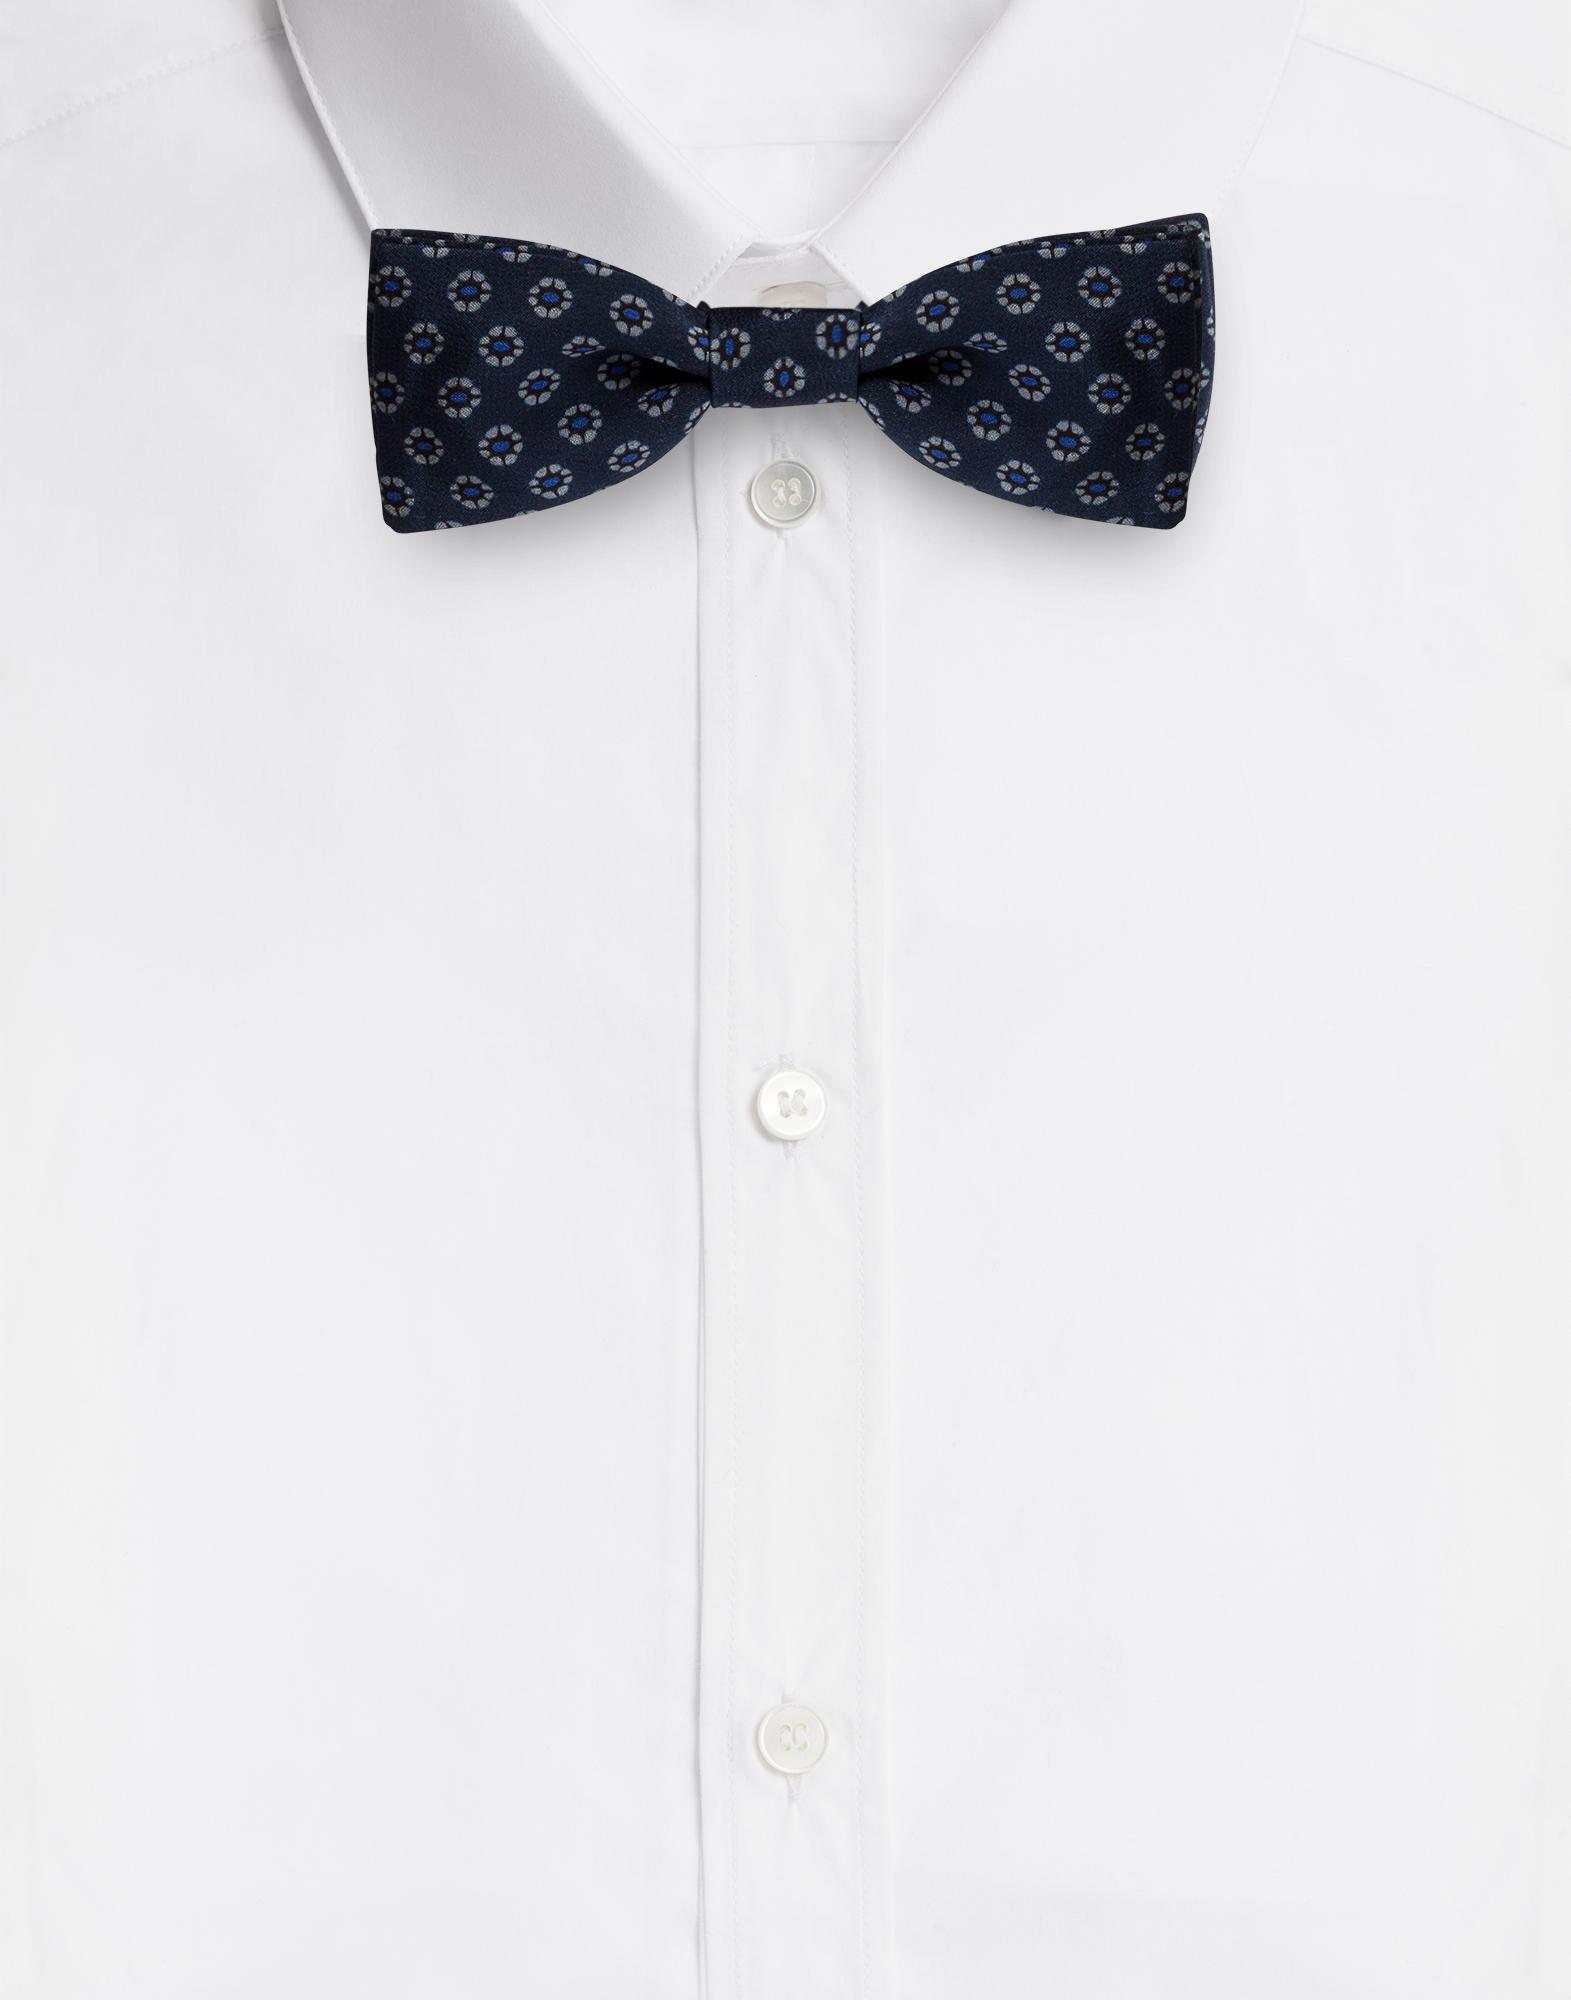 Dolce & Gabbana BOW-TIE IN PRINTED SILK